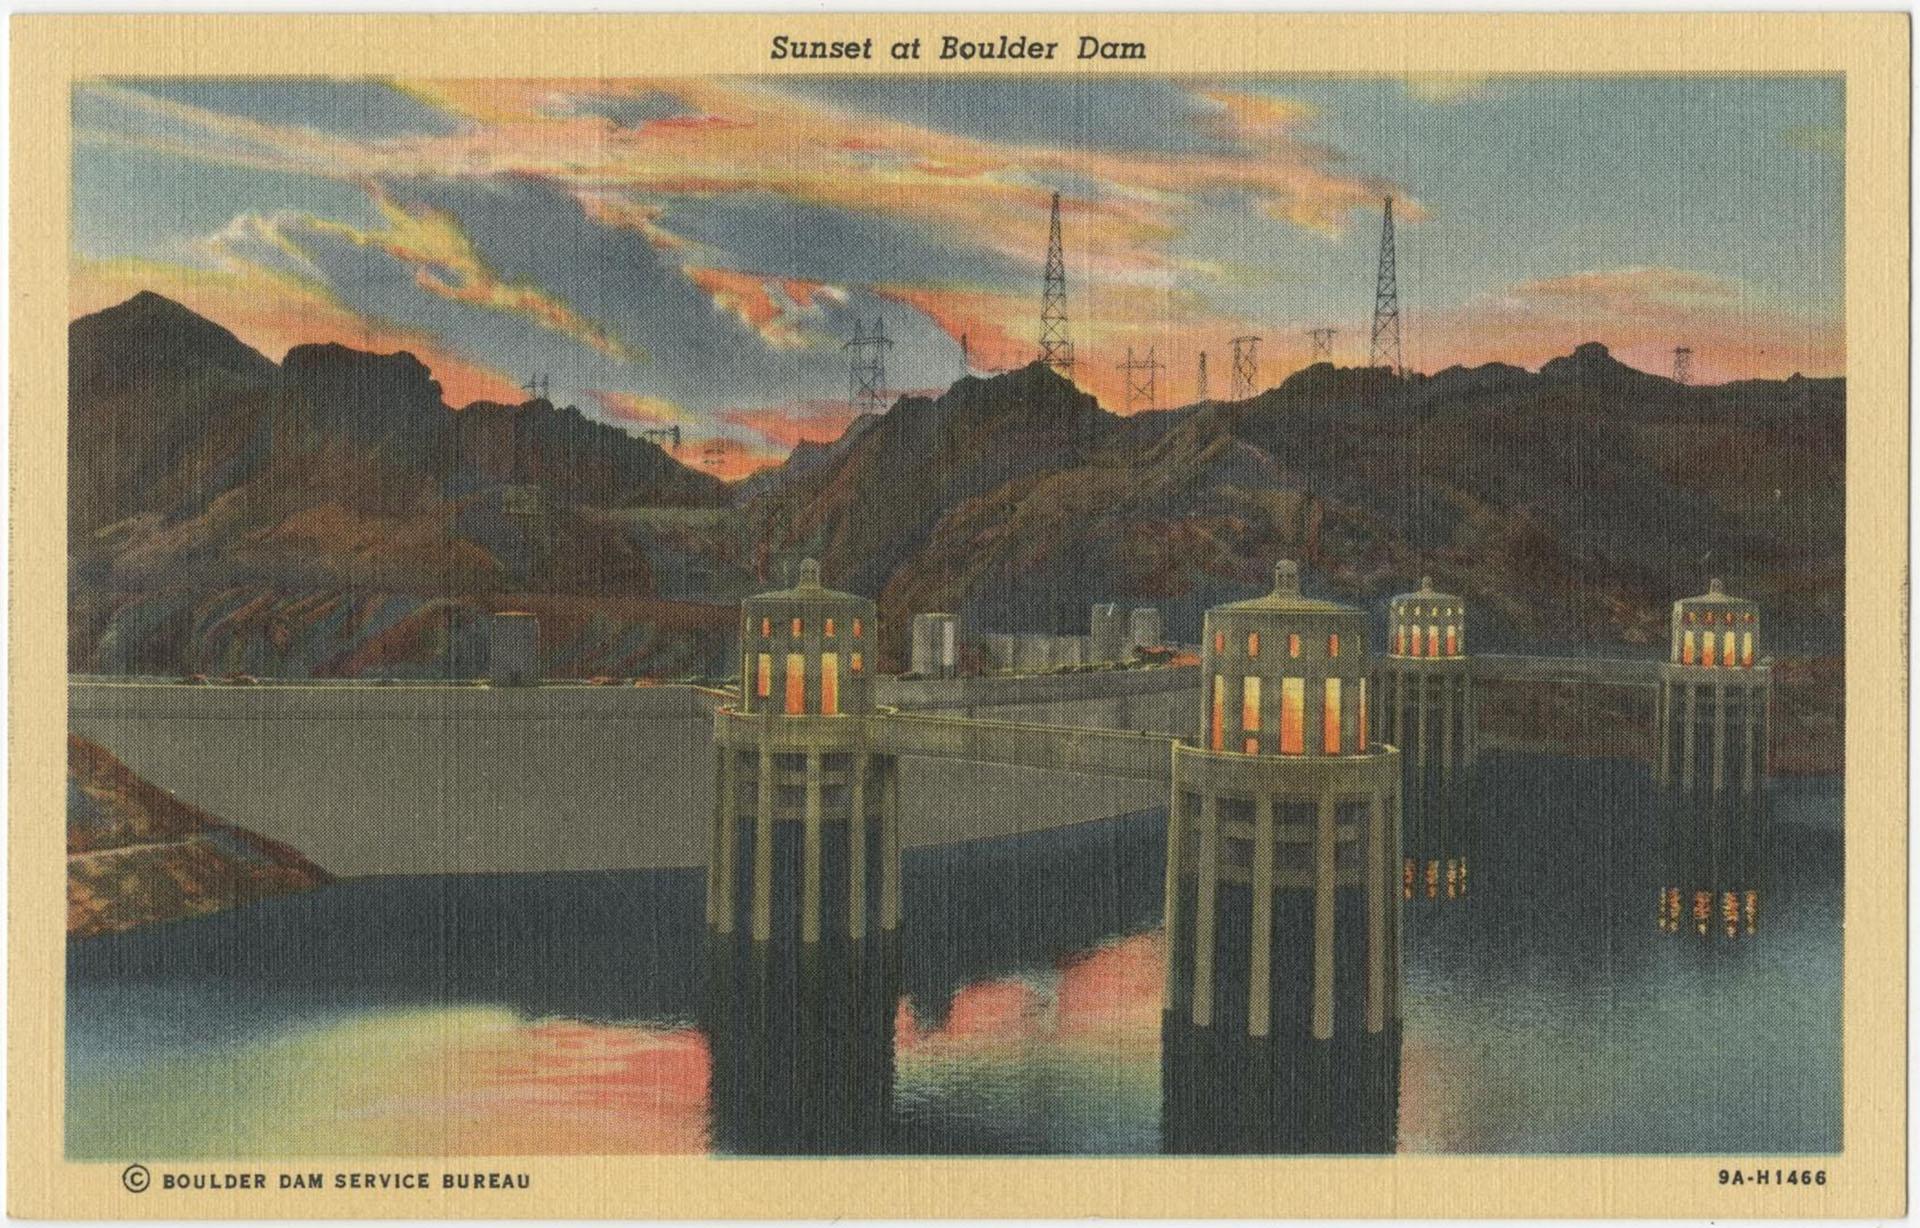 Sunset at Boulder Dam